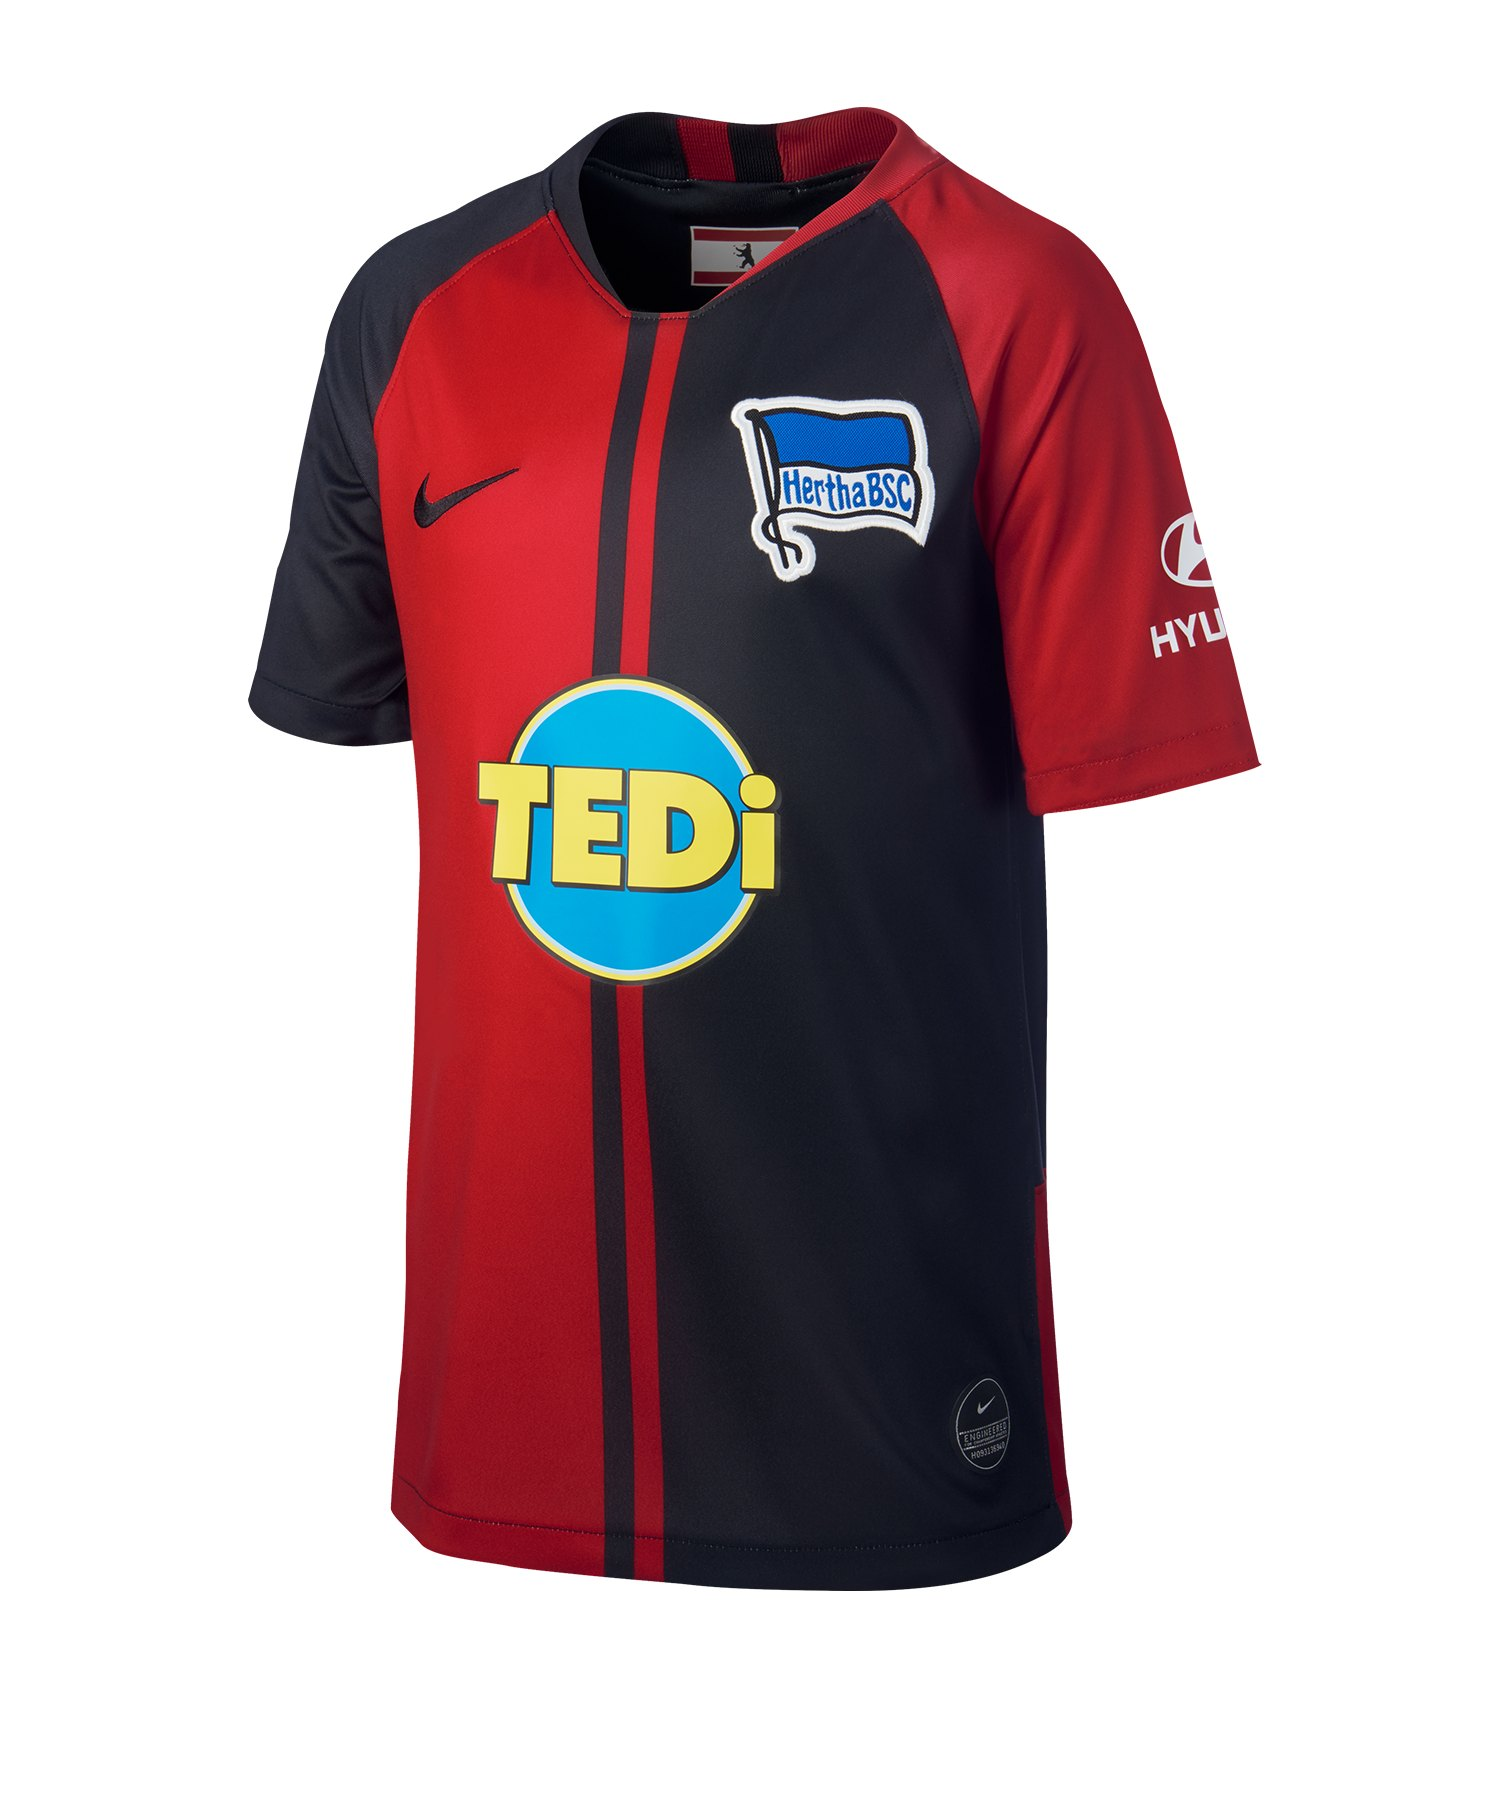 Hertha Bsc Trikot Ohne Sponsor